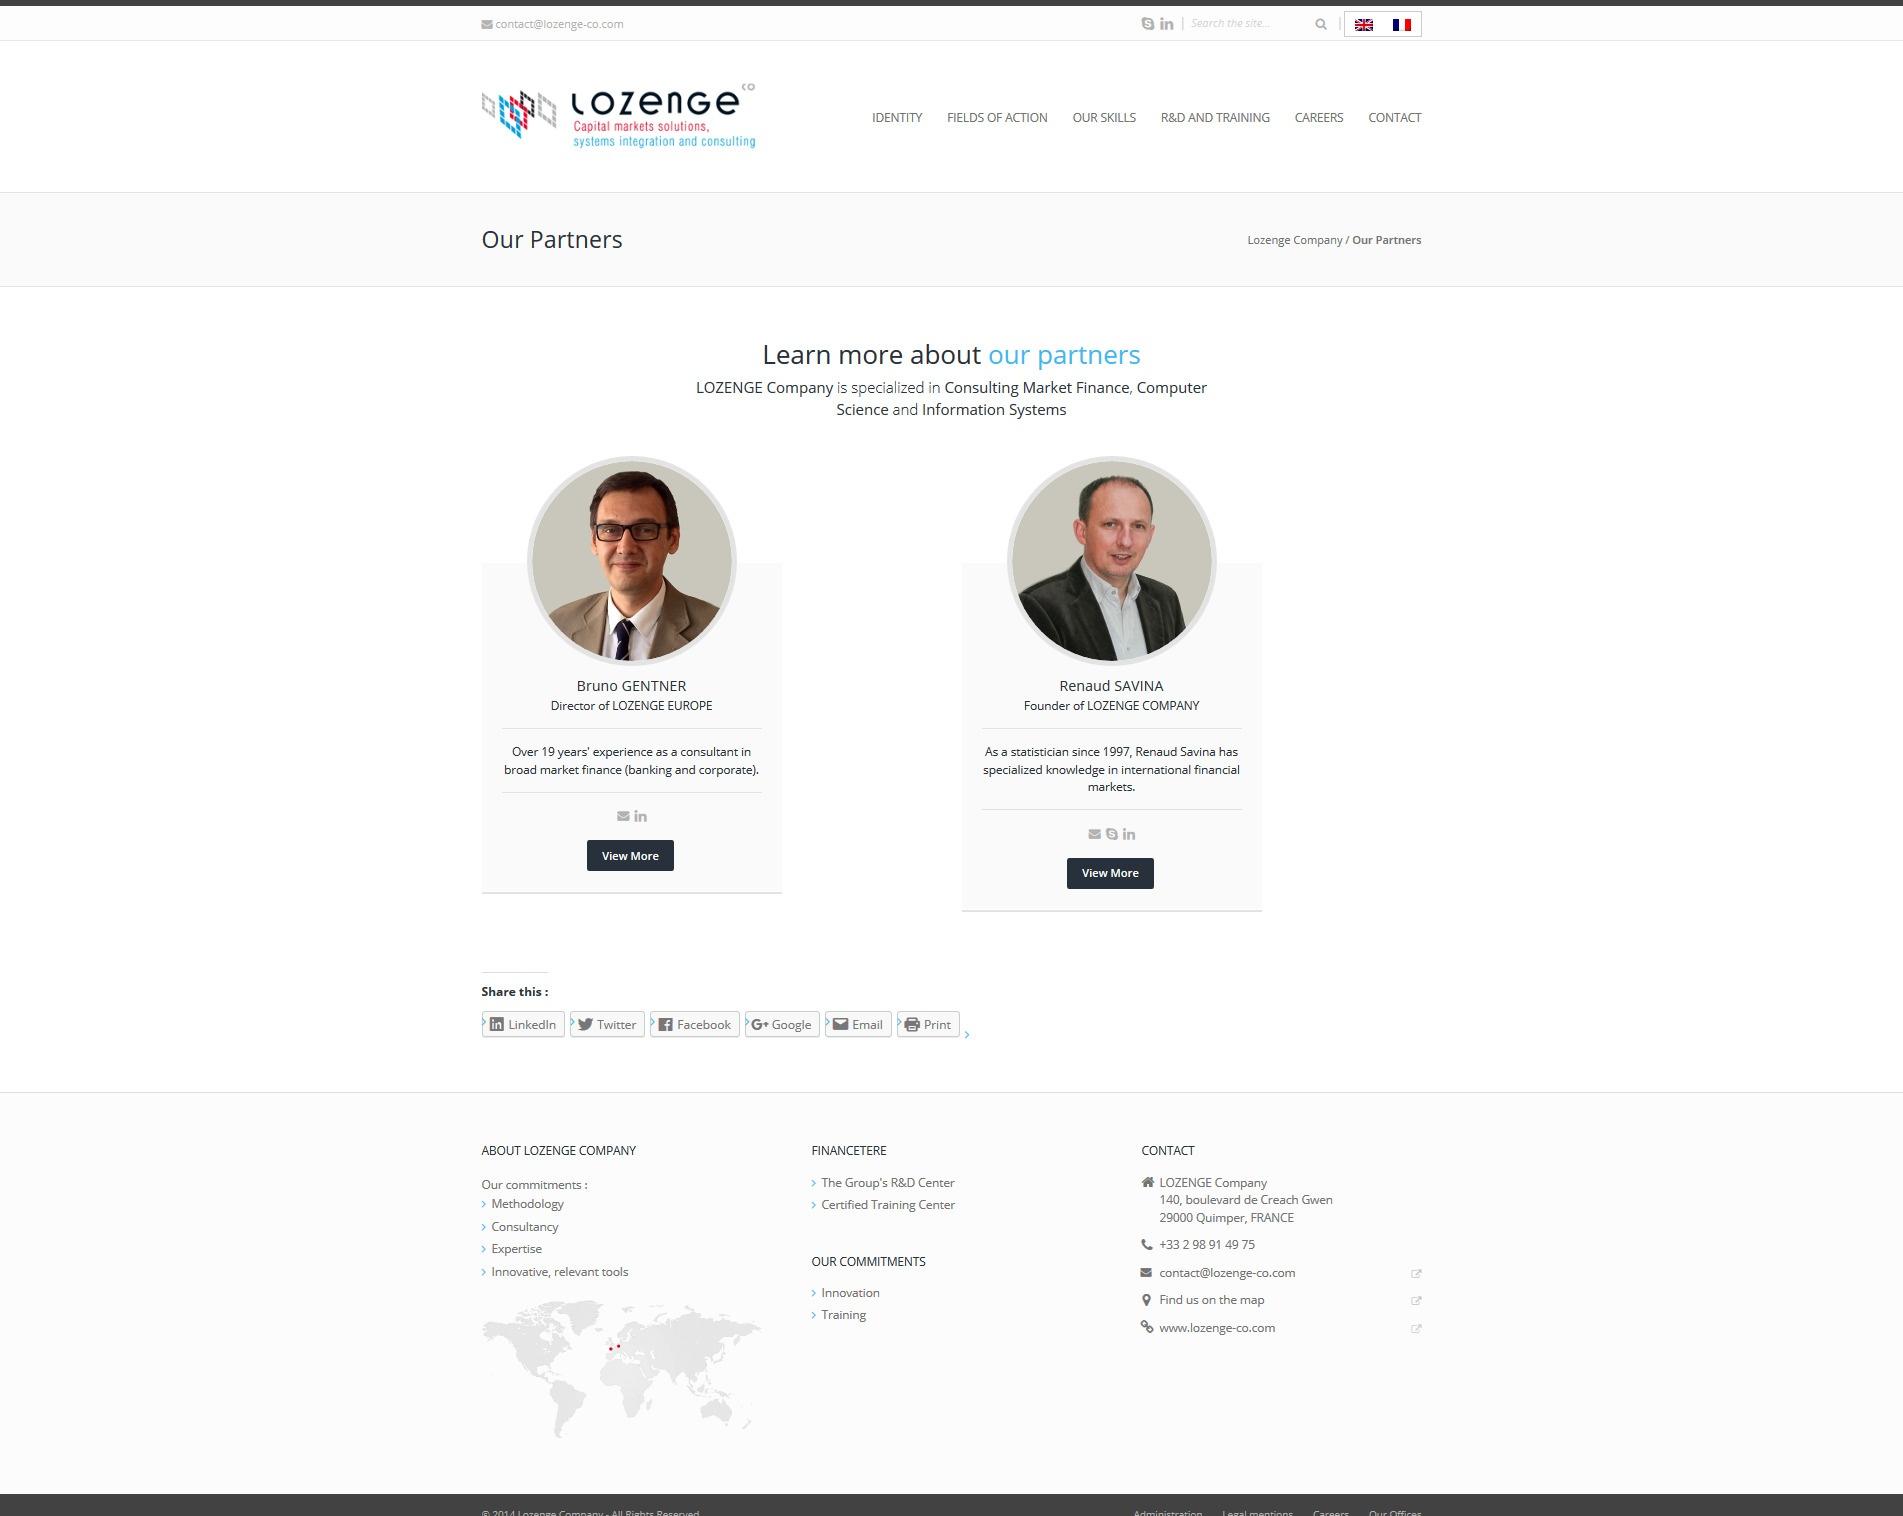 Lozenge Company - Partenaires